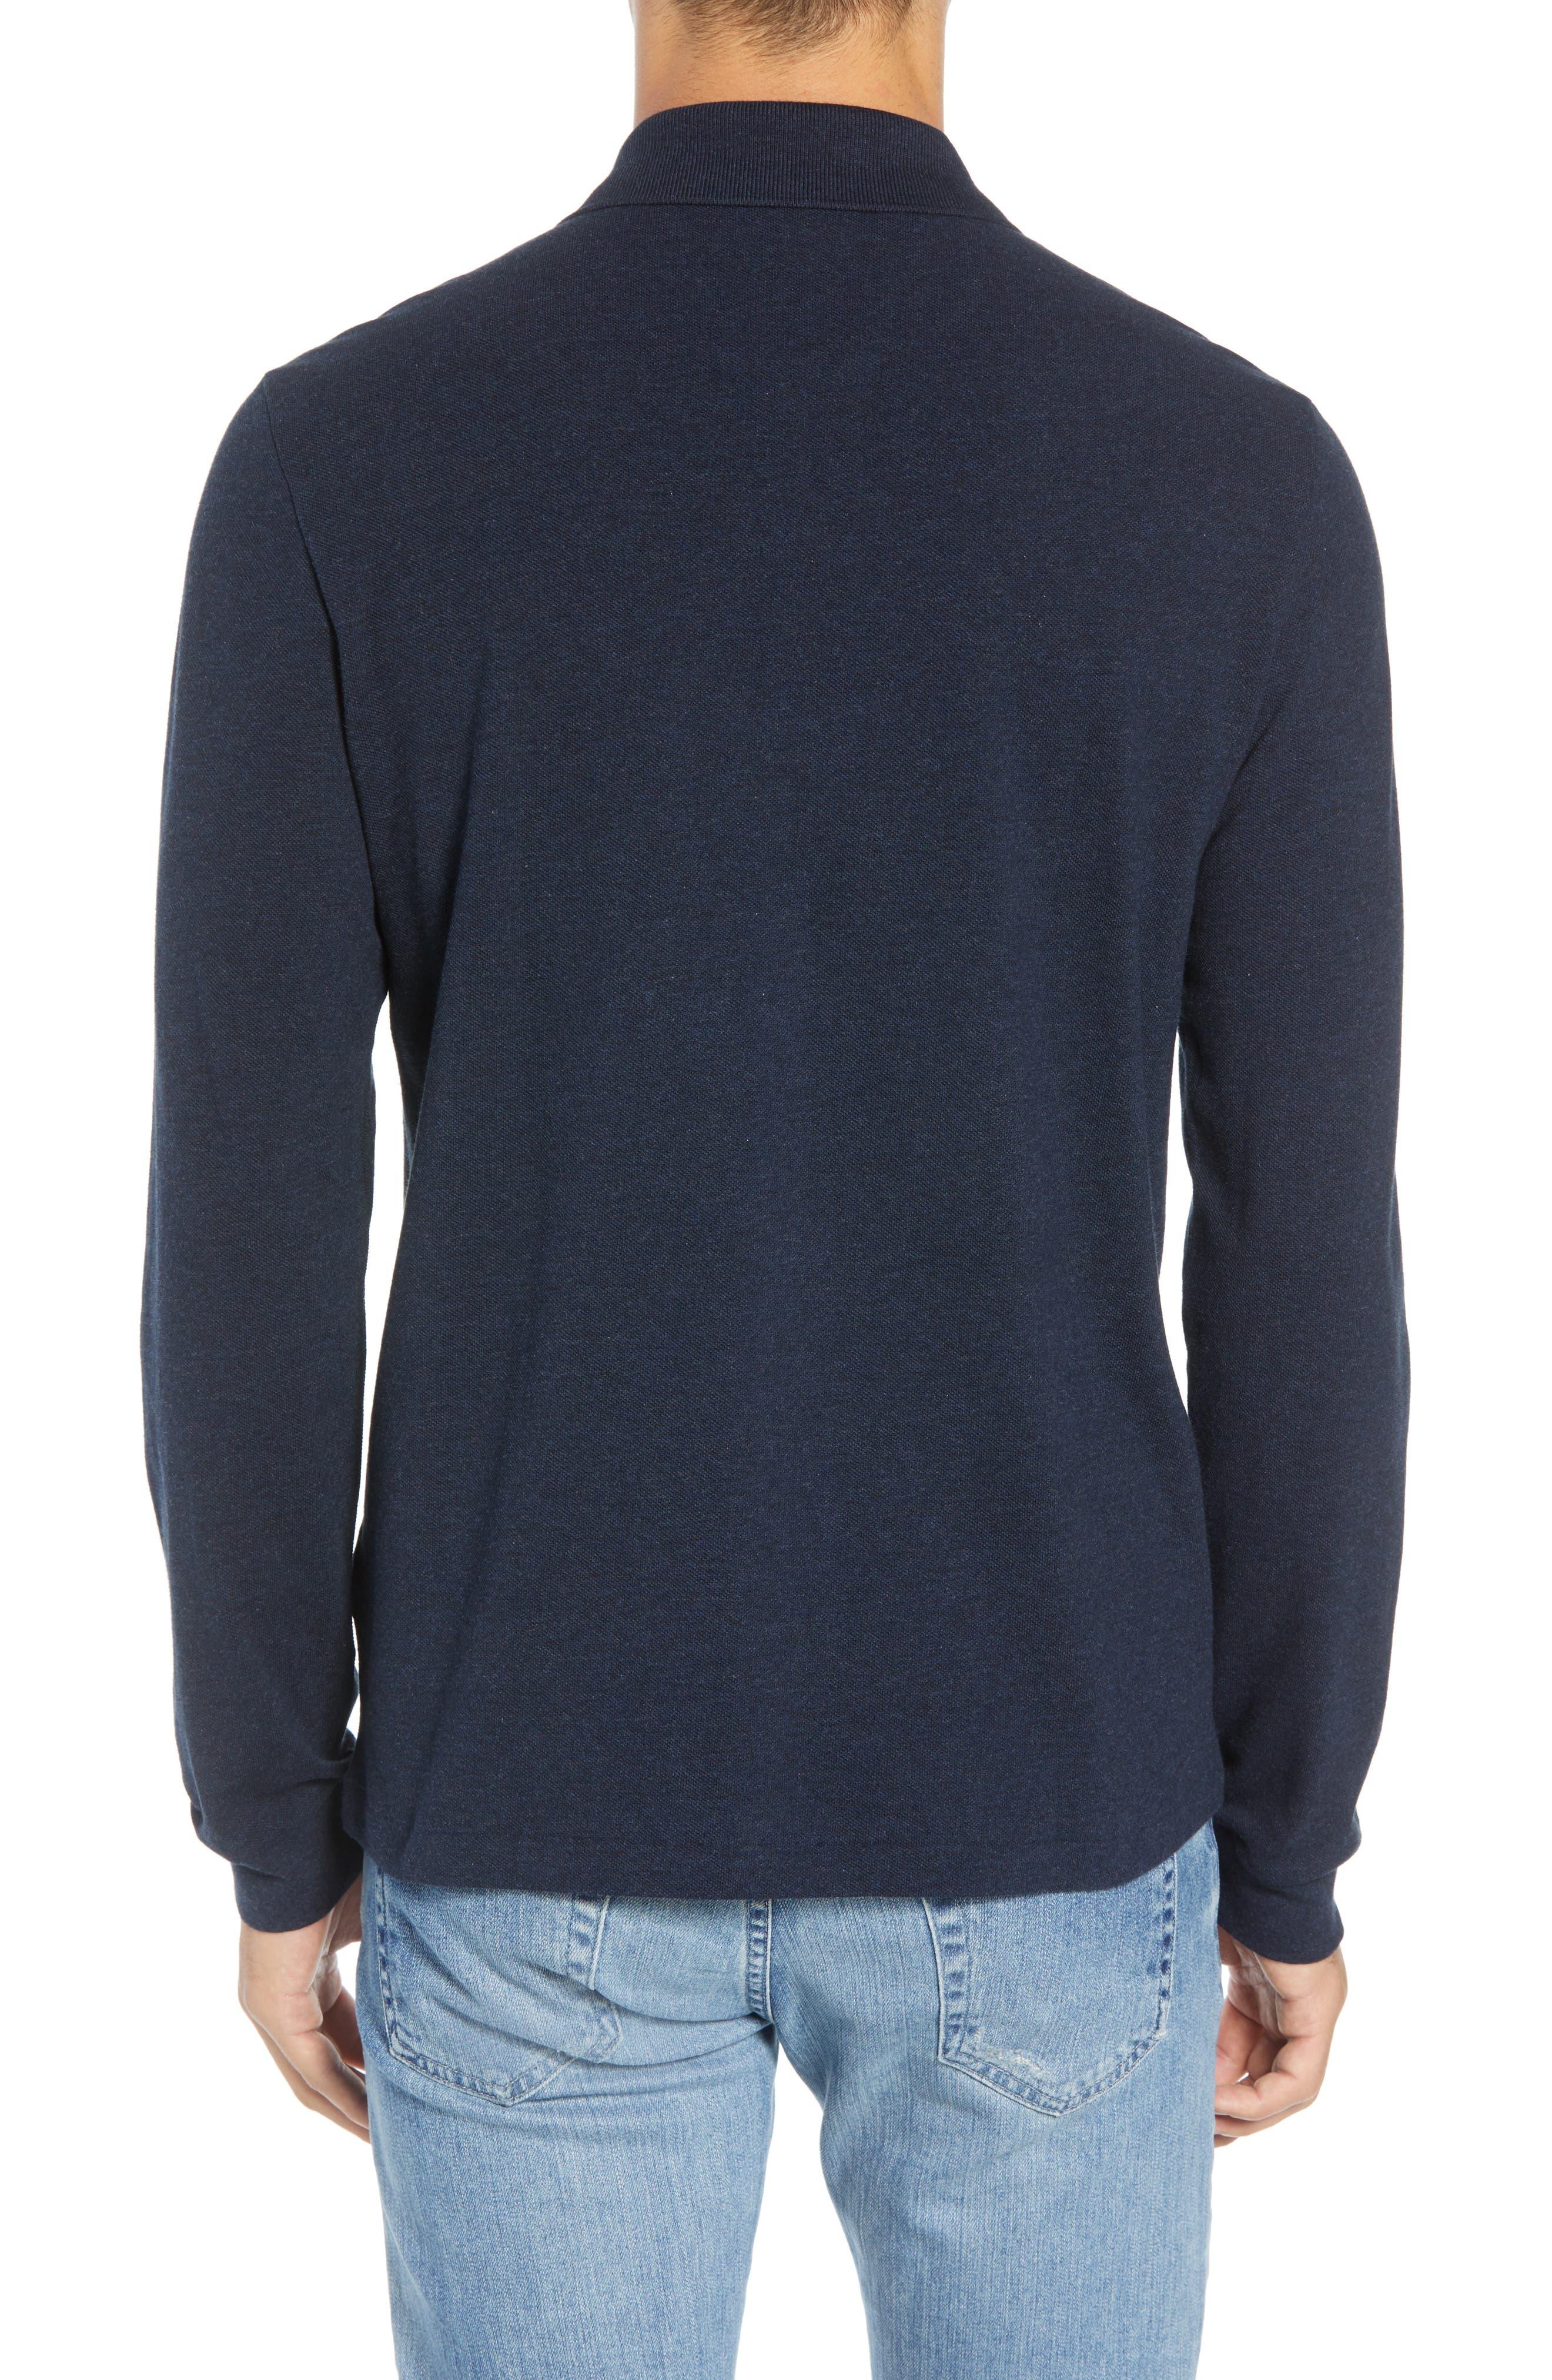 LACOSTE, Long Sleeve Piqué Polo, Alternate thumbnail 2, color, ECLIPSE BLUE CHINE